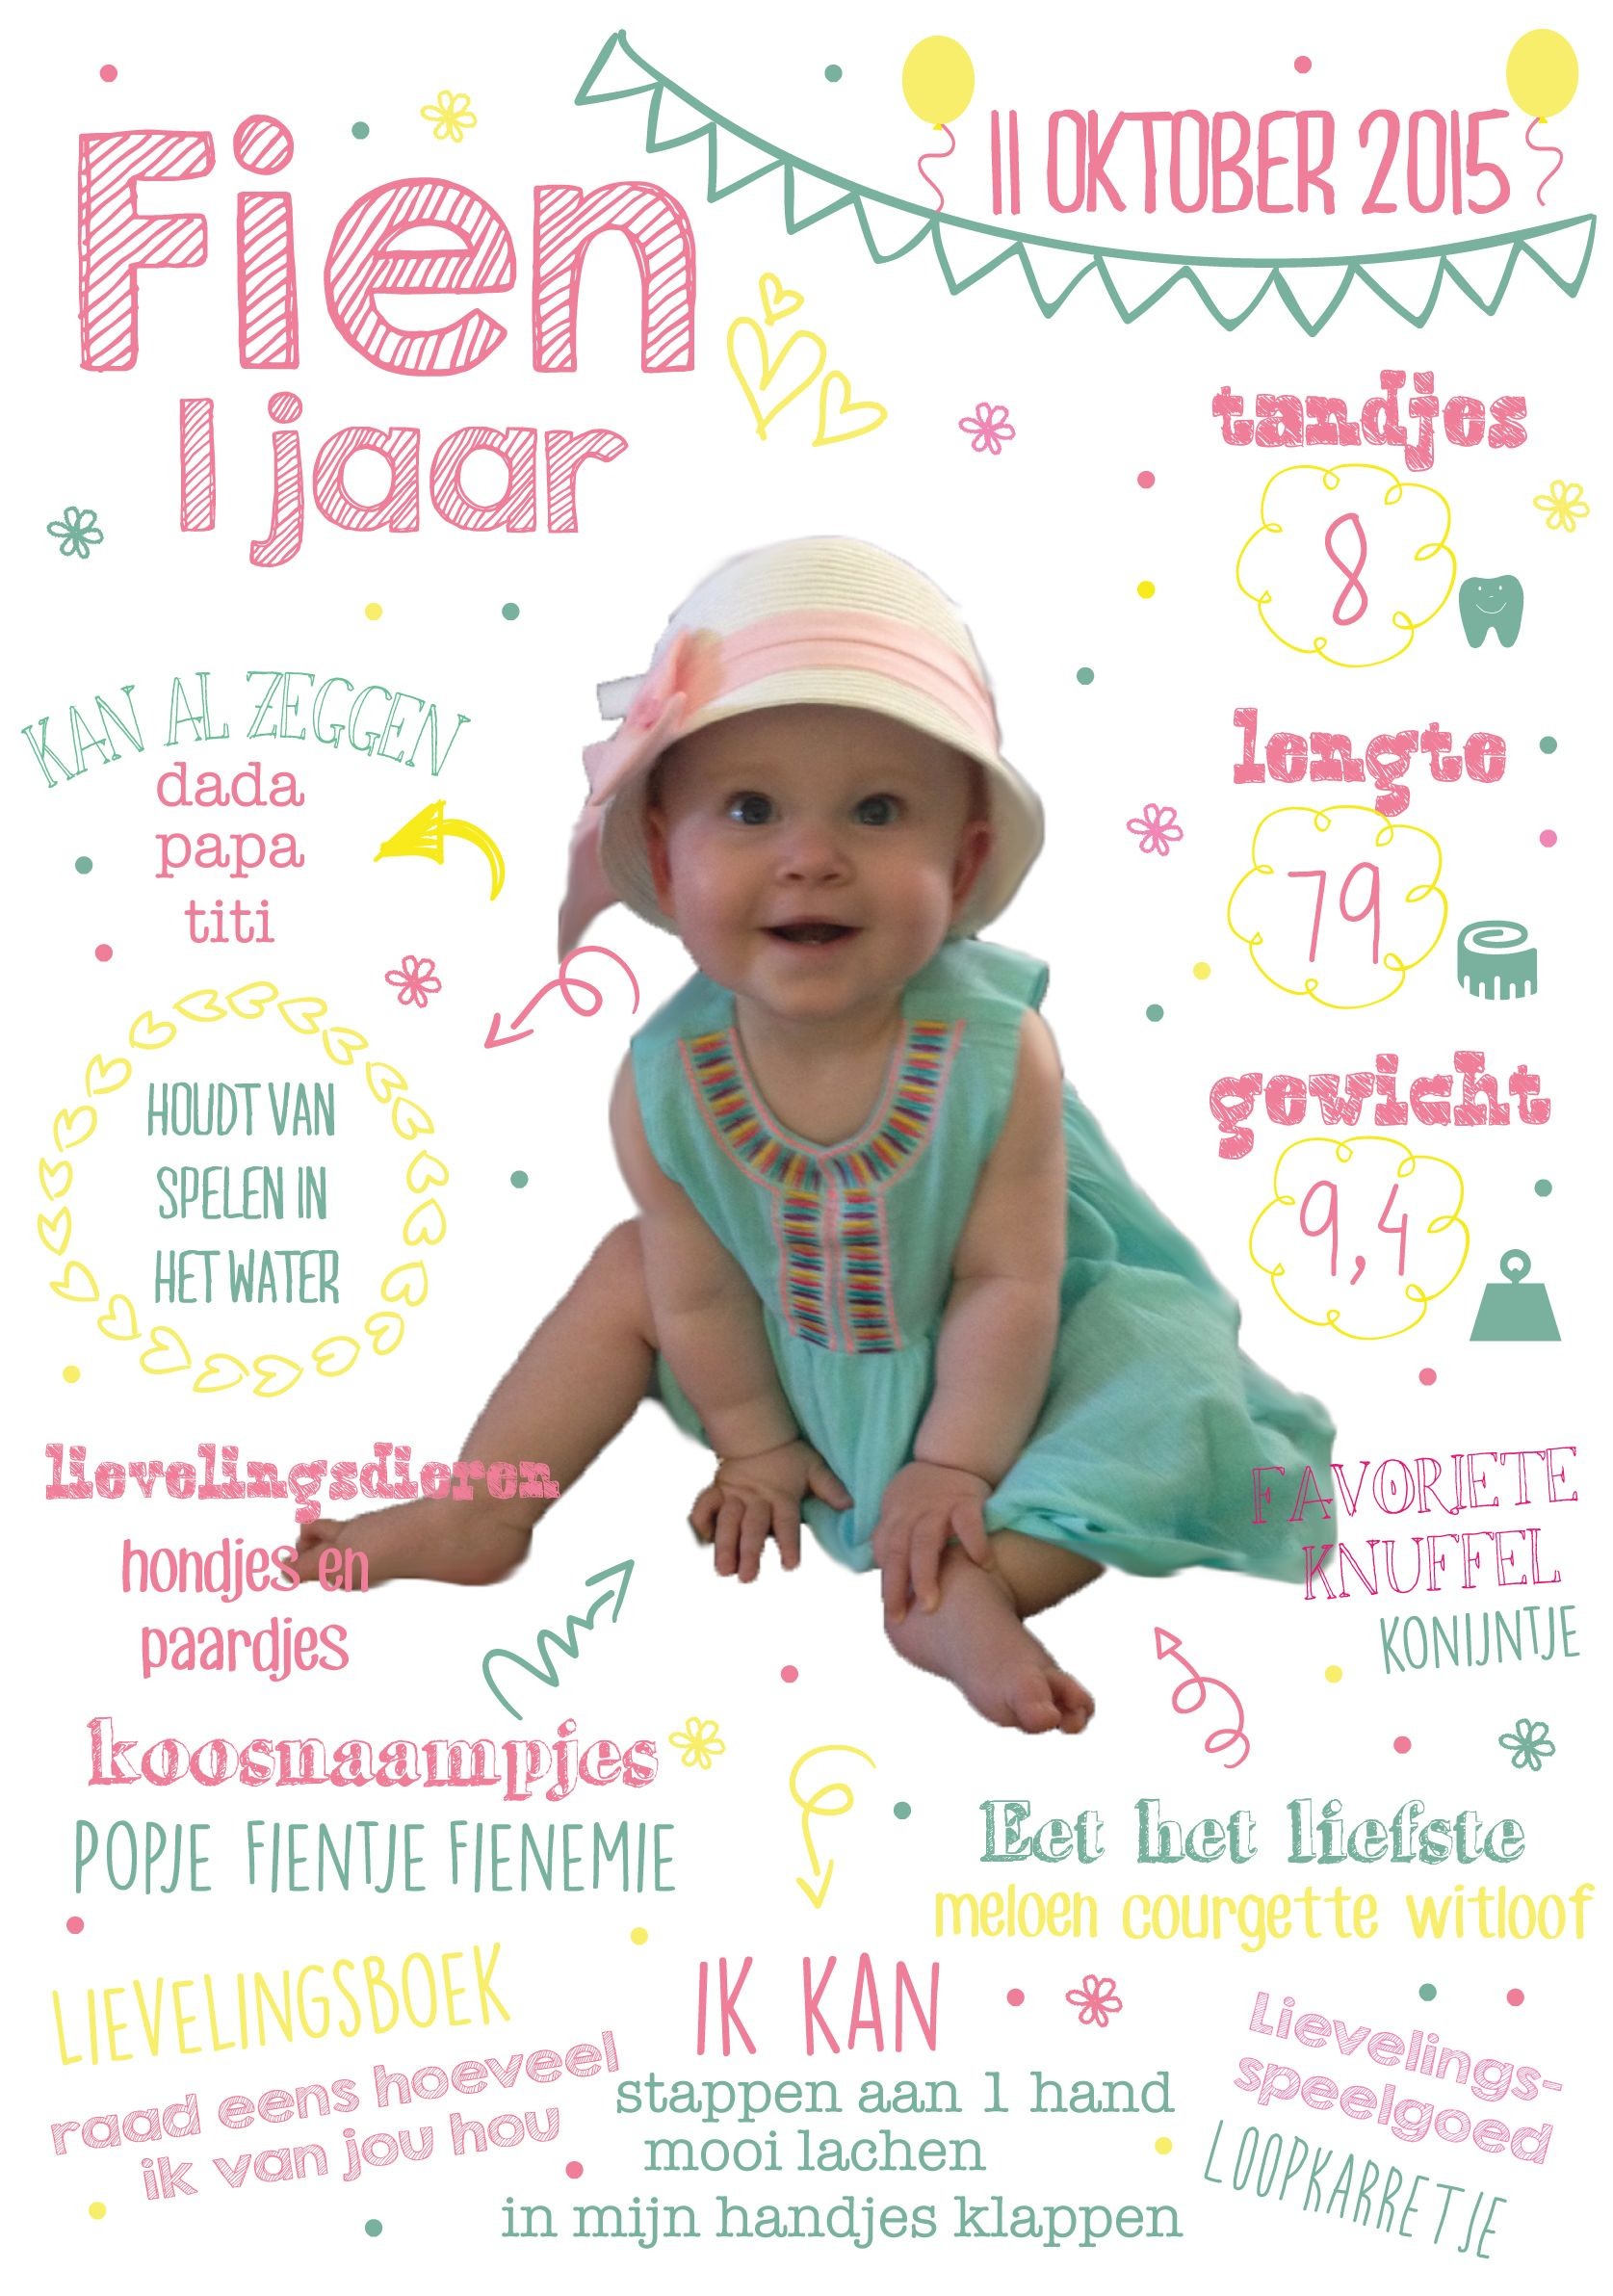 Spiksplinternieuw eerste verjaardag 1 jaar foto meisje feest uitnodiging uniek EI-21